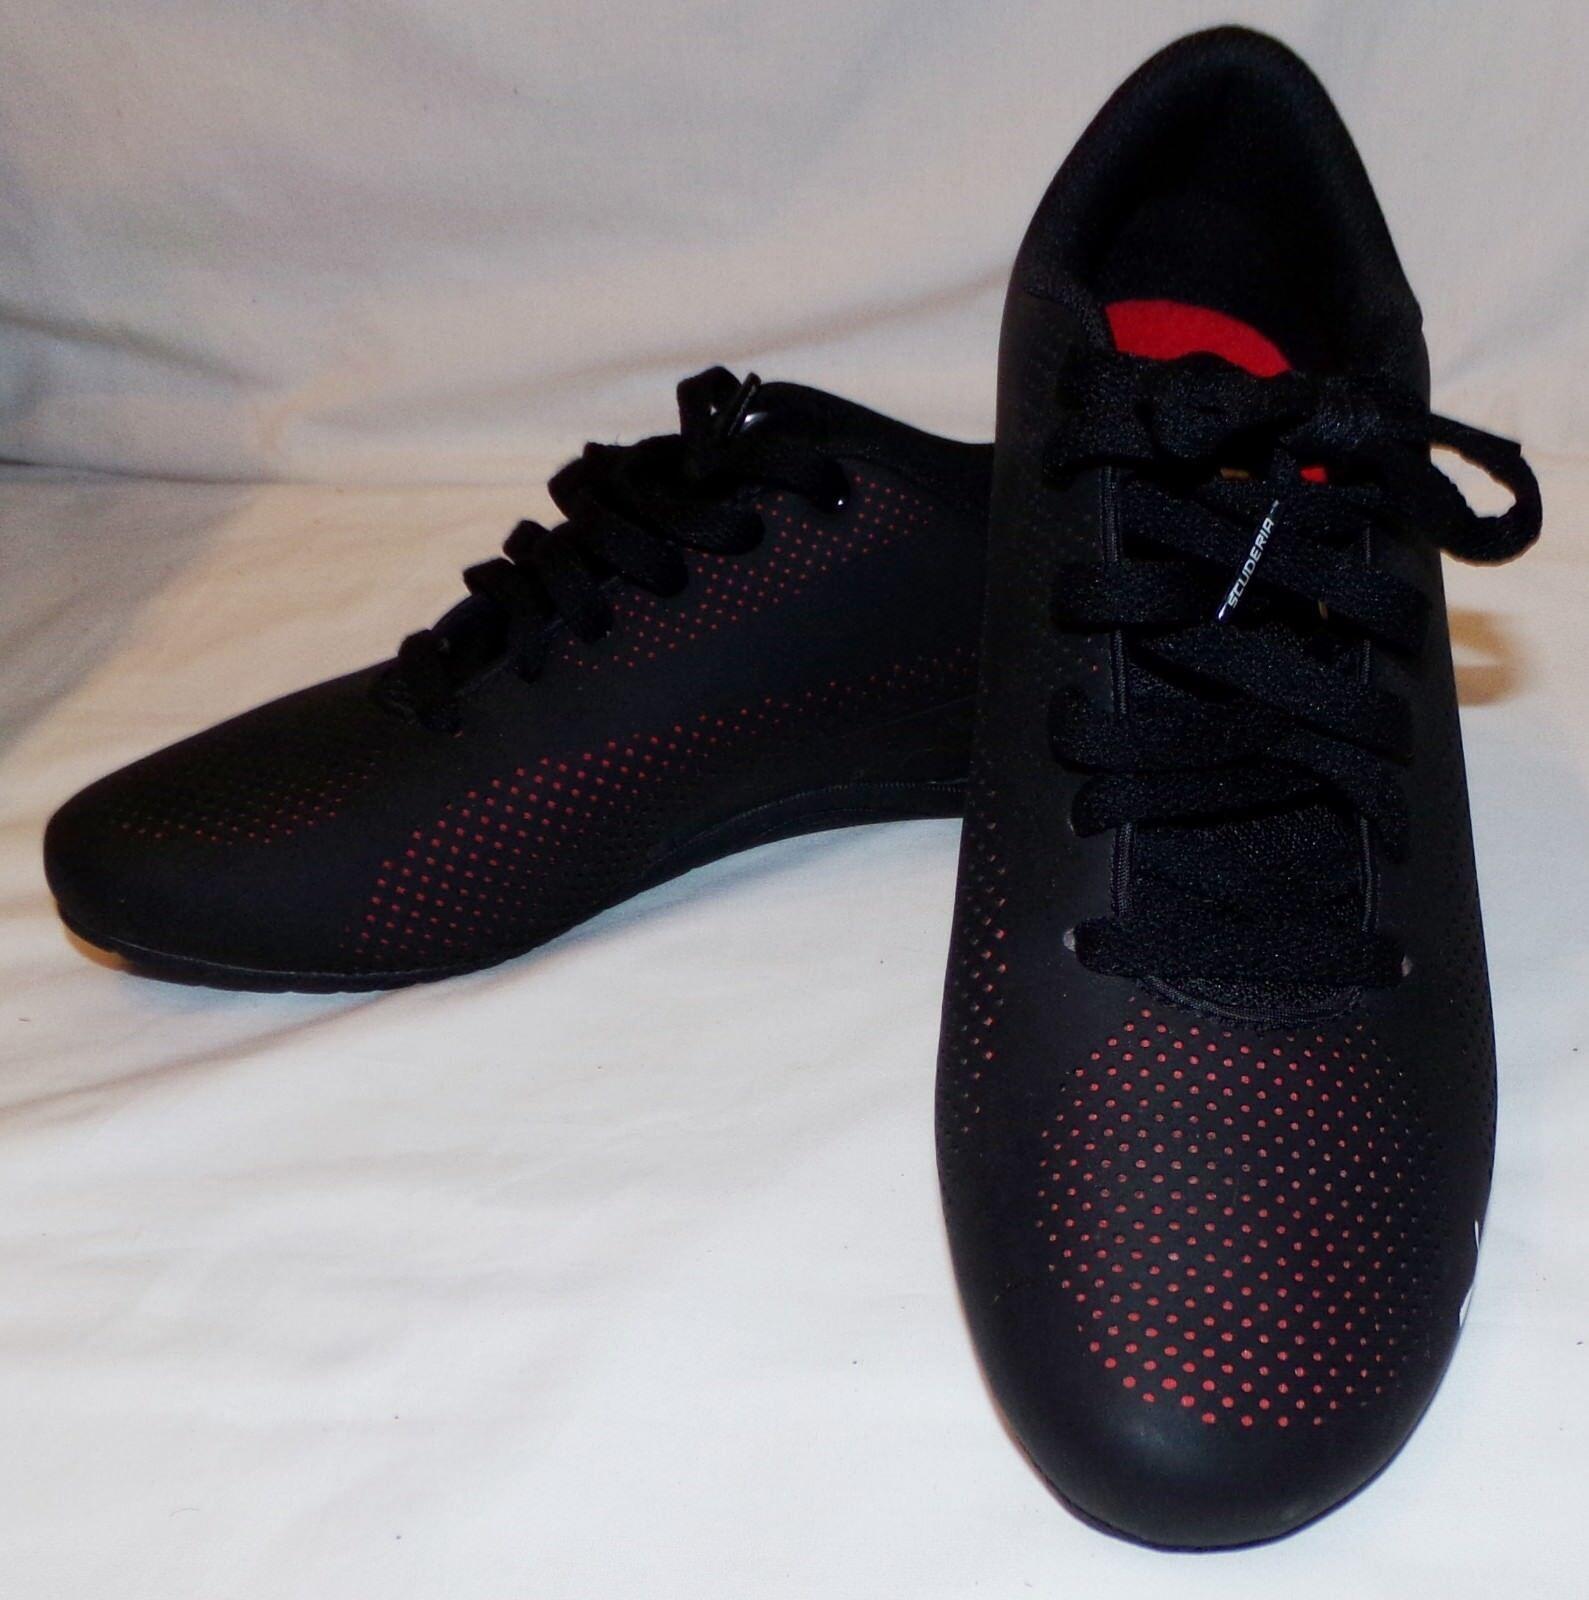 Puma Sf Ferrari Force Chat Ultra Hommes Chaussures Athlétisme 8.5 Modèle